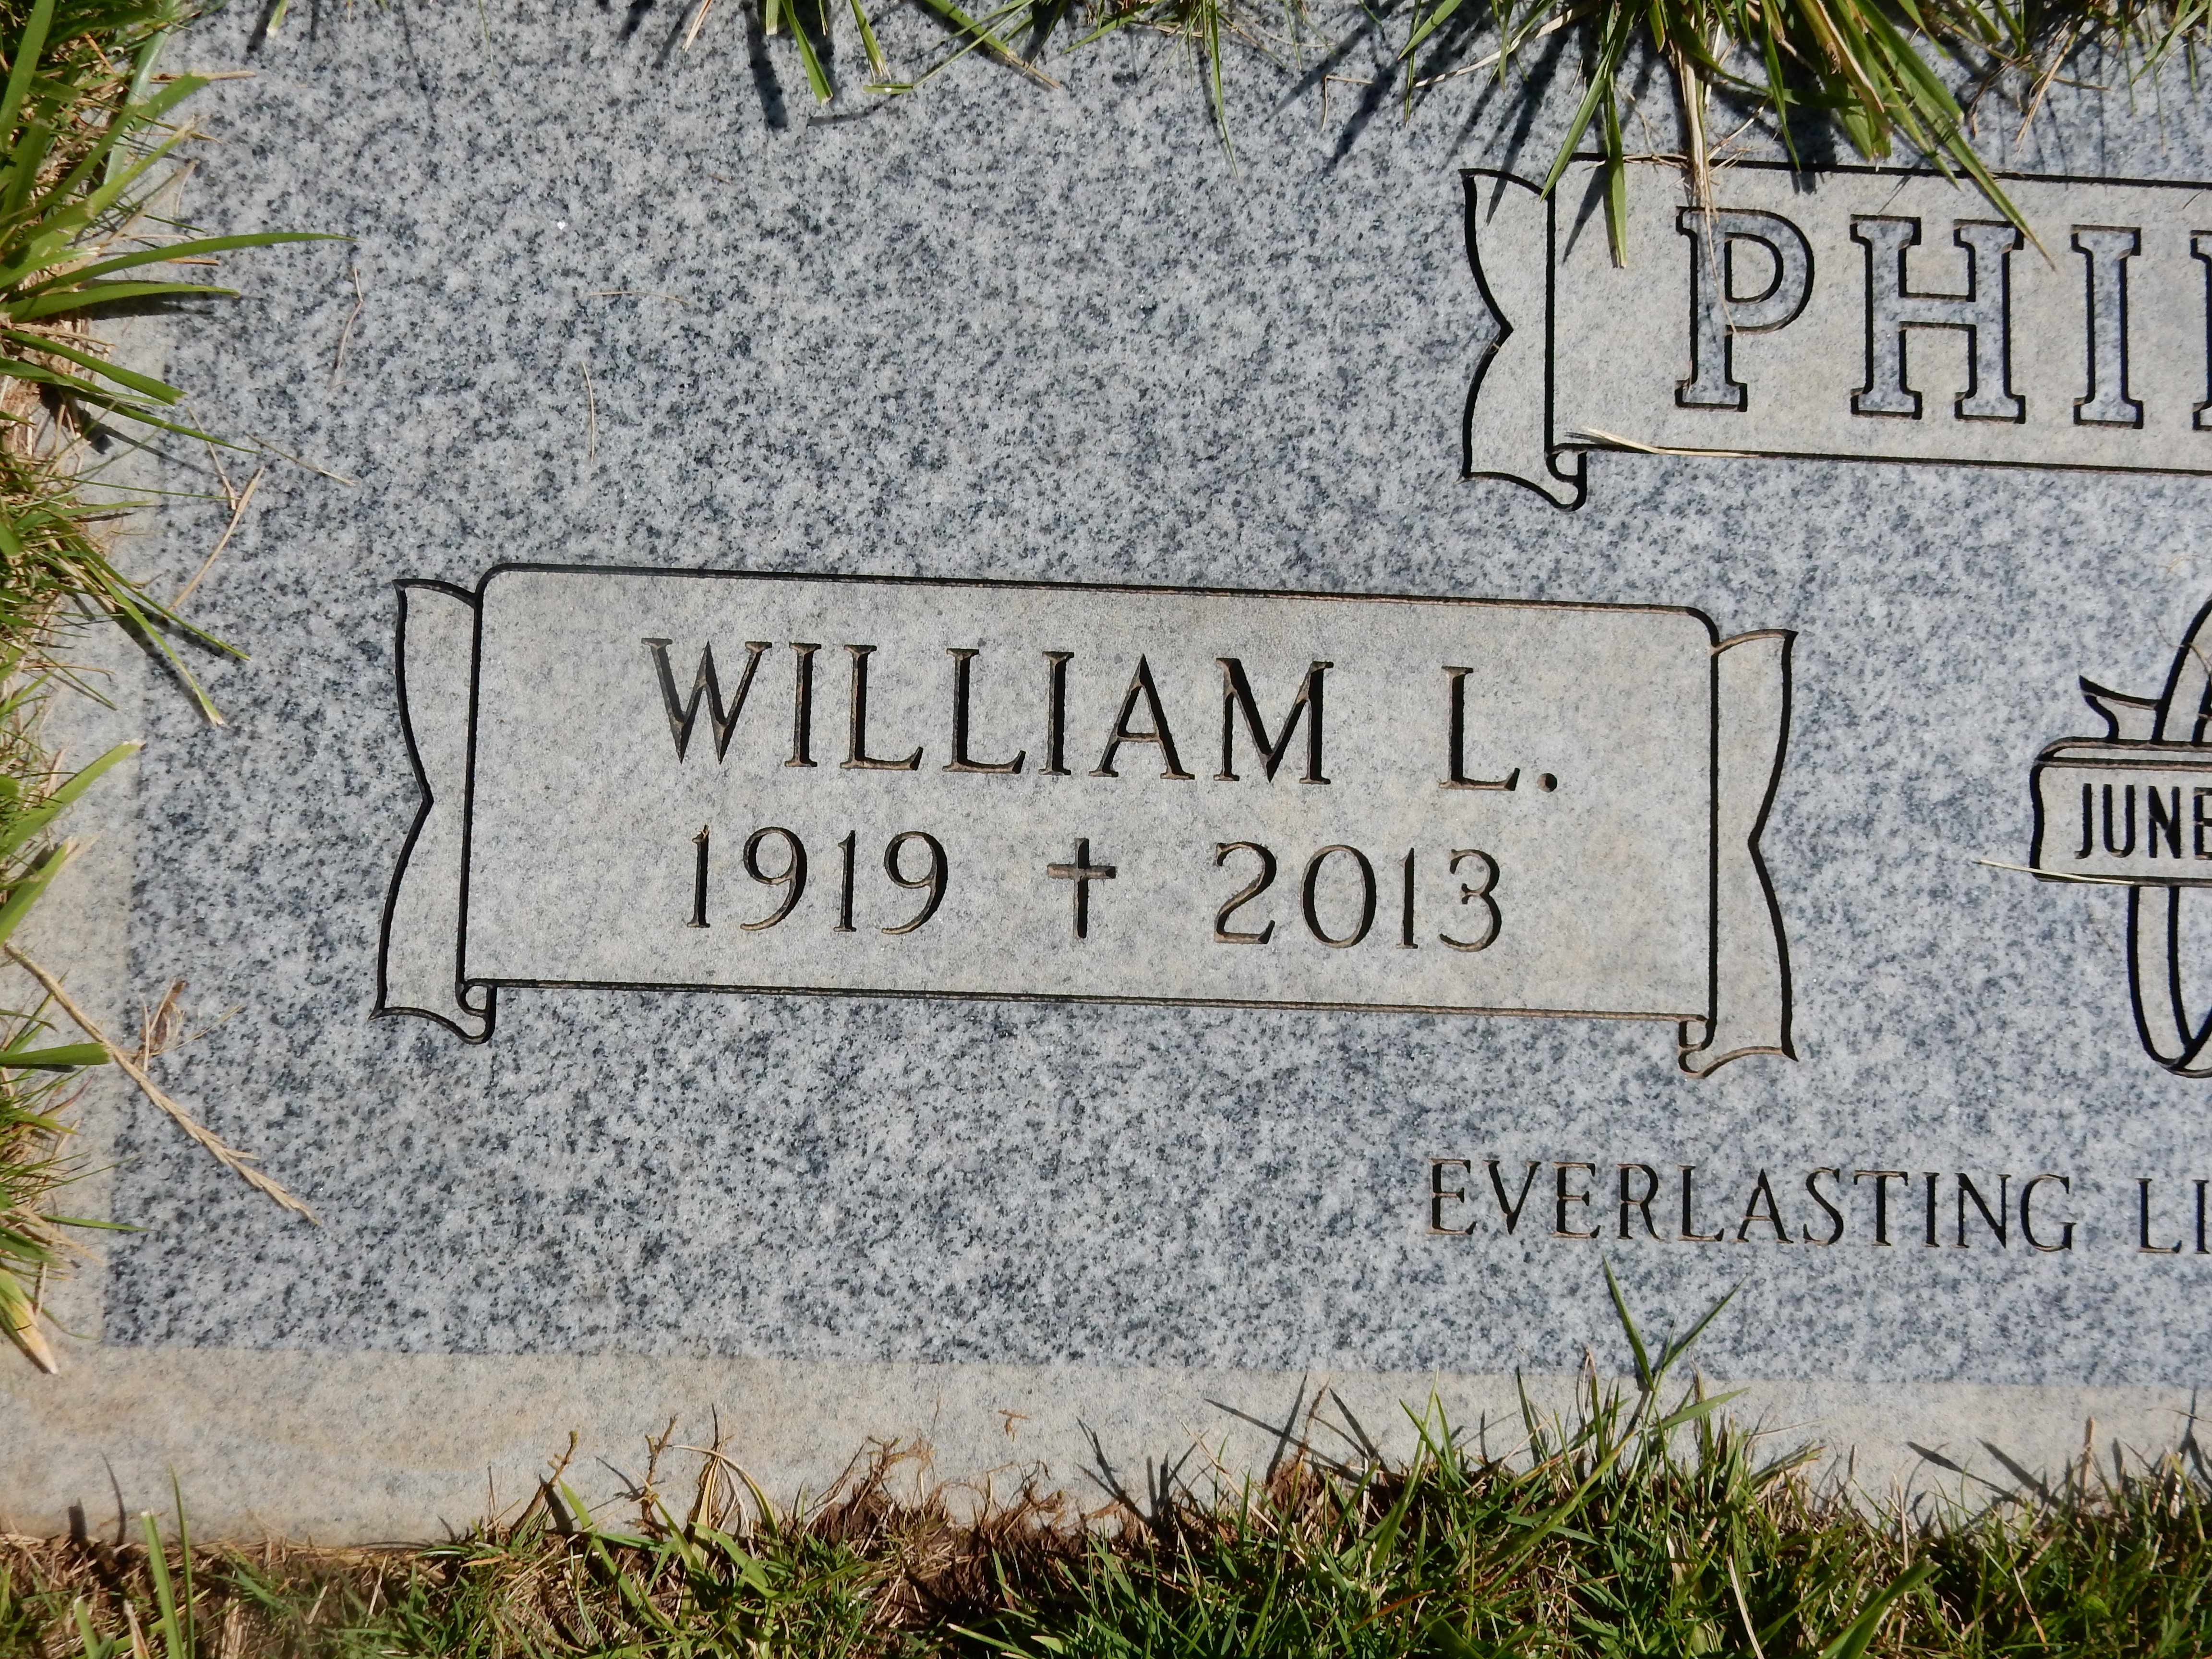 William Lloyd Phillips 1919 2013 Find A Grave Memorial